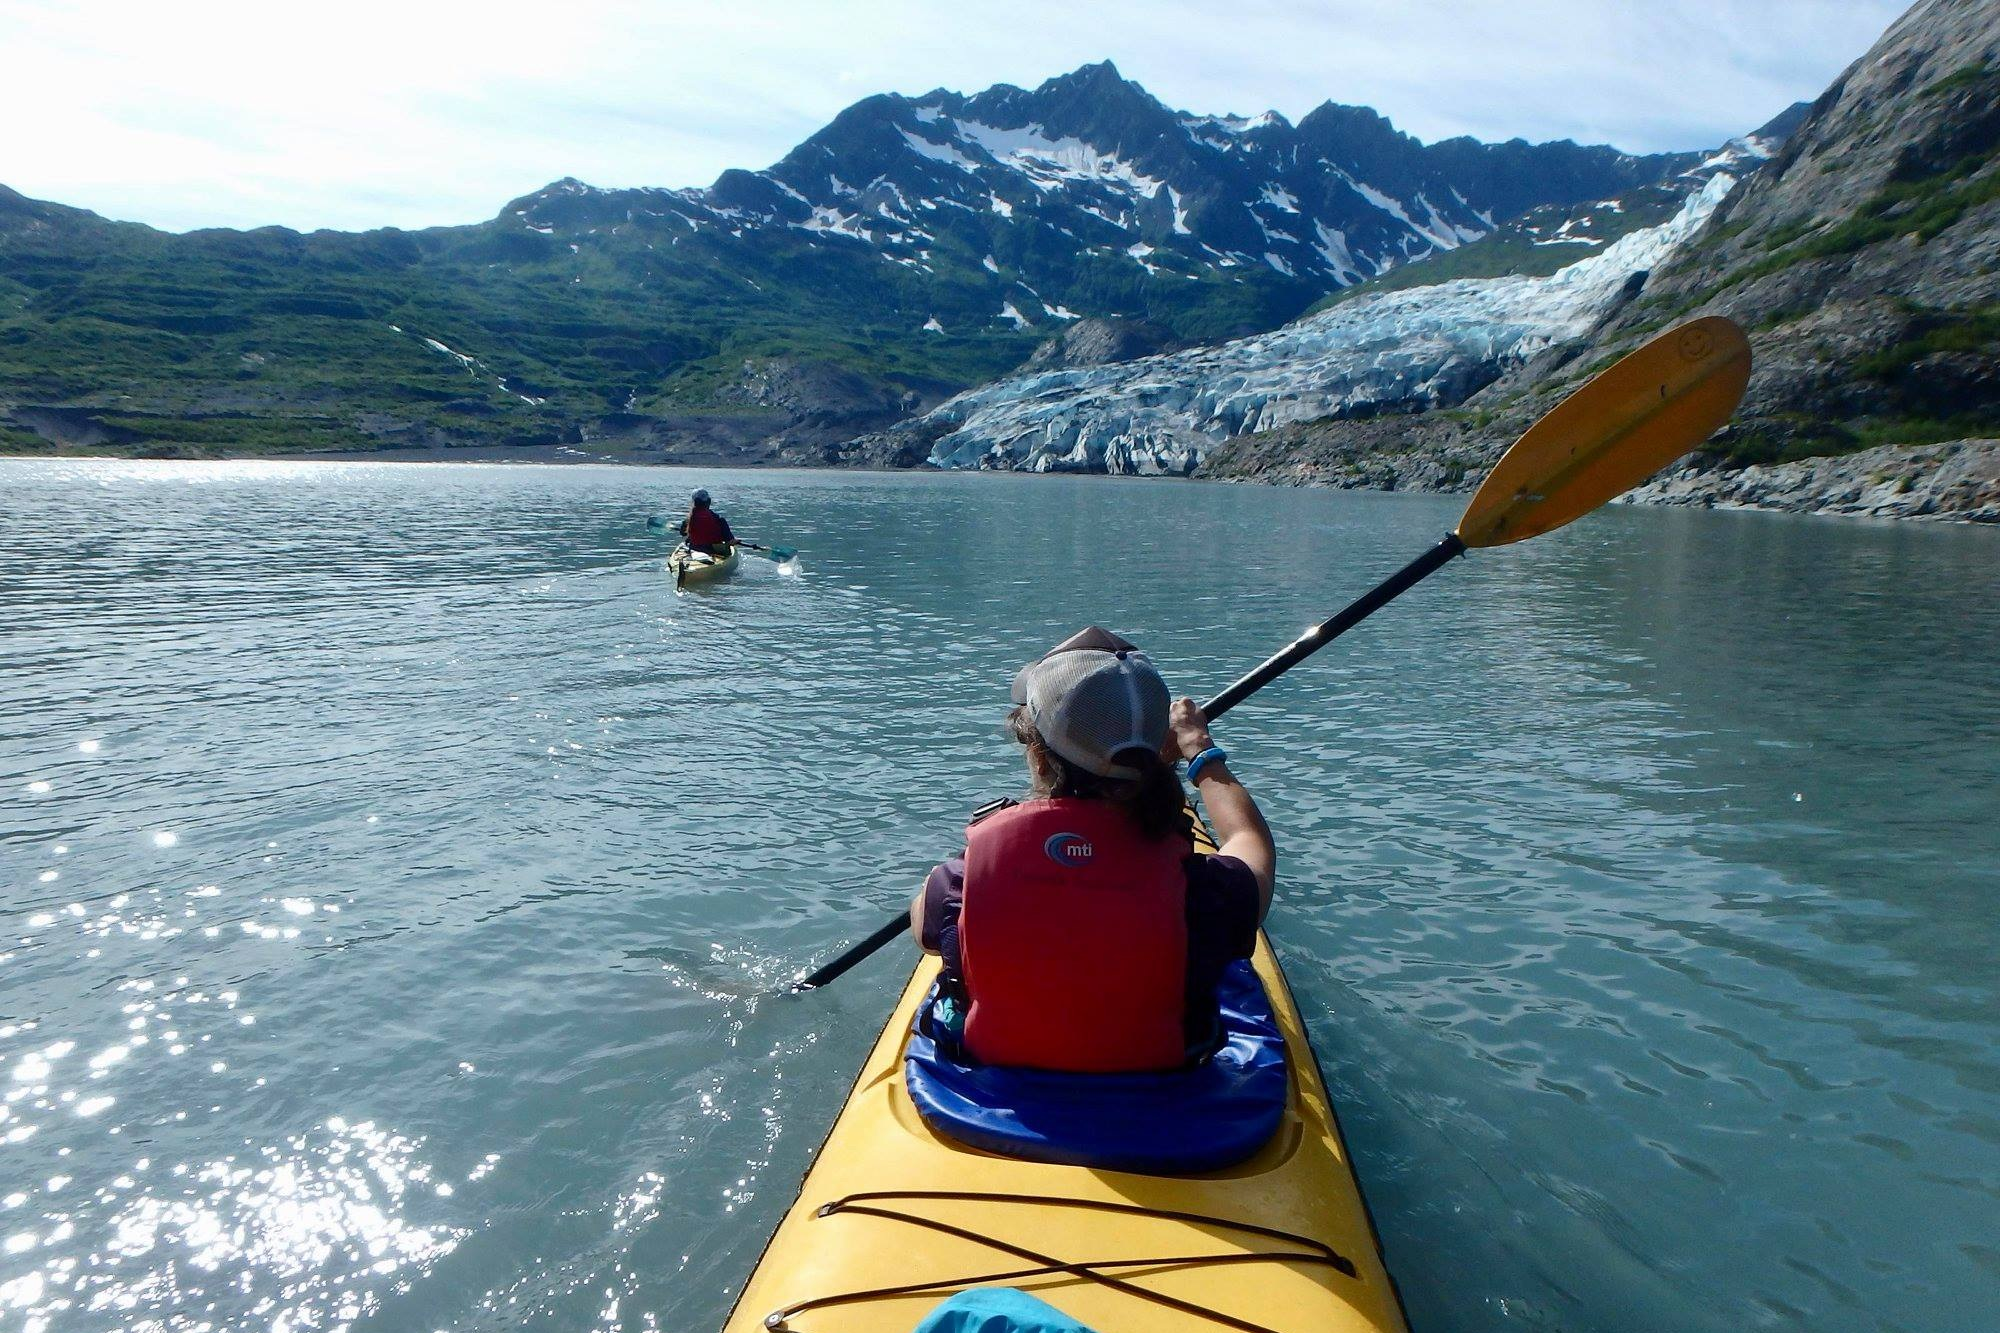 Photo Credit: Alaska Alpine Adventures